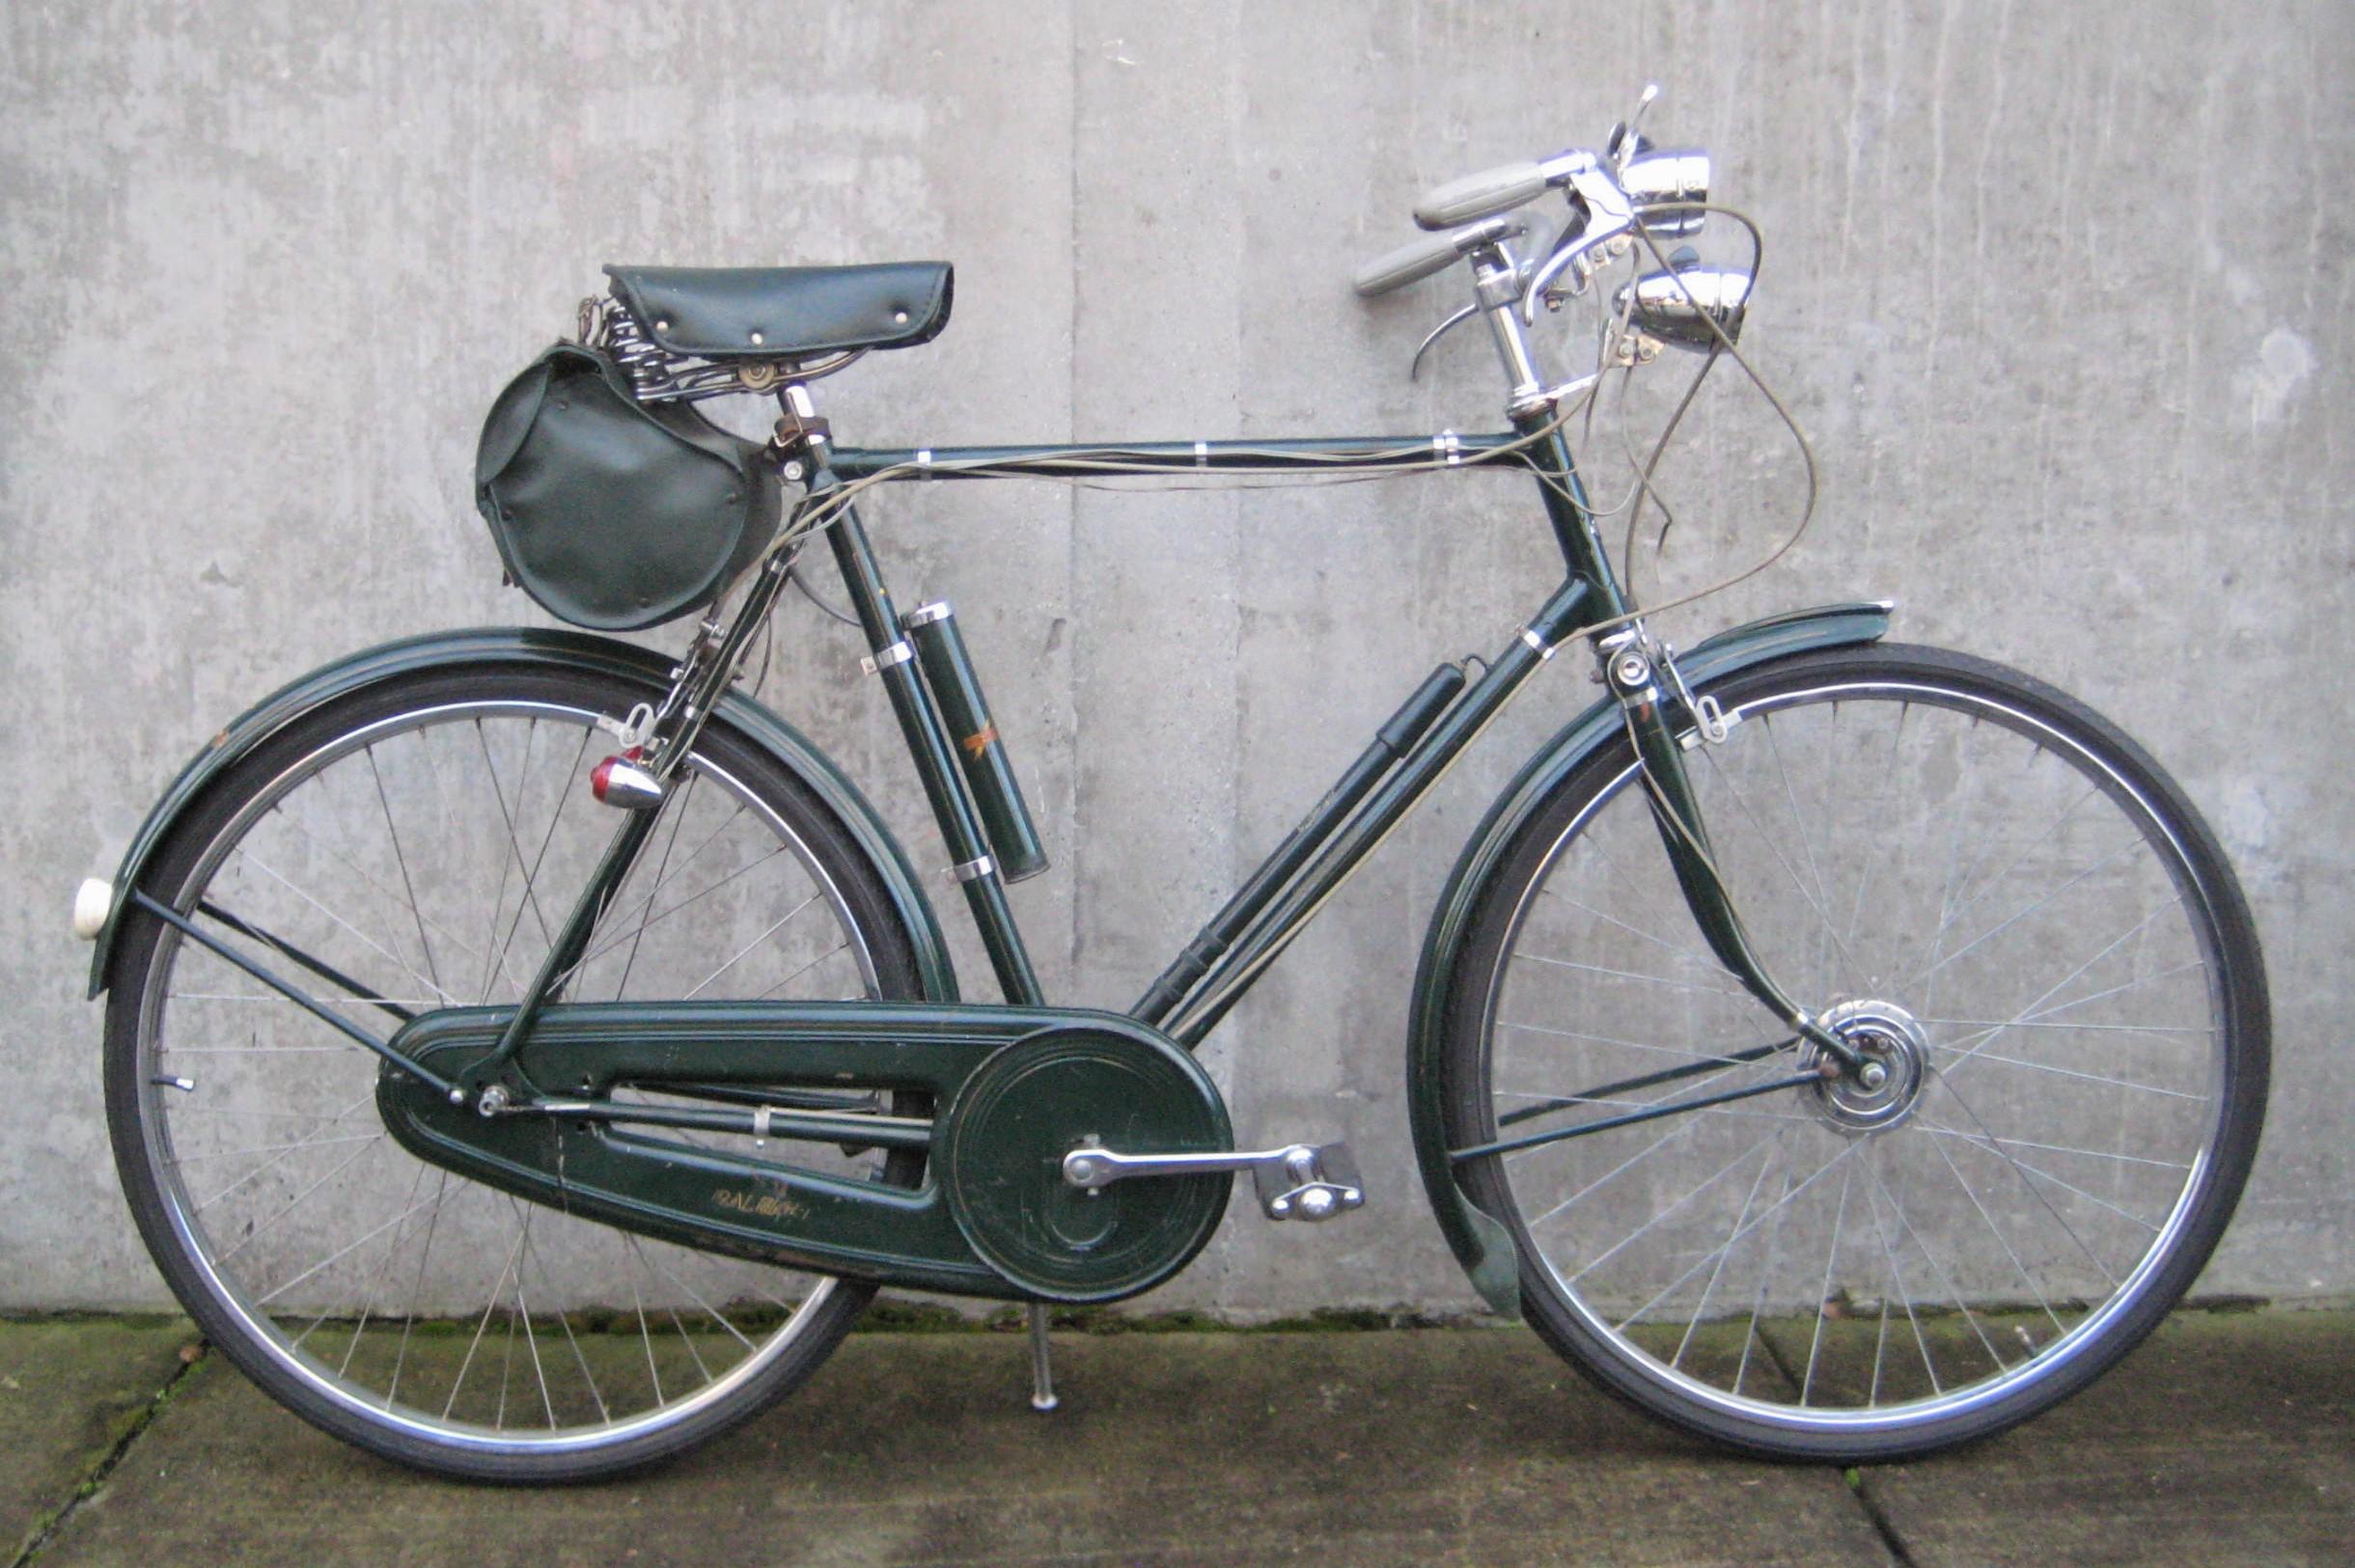 1966 Raleigh Model 24 bike at Classic Cycle Bainbridge | Classic ...